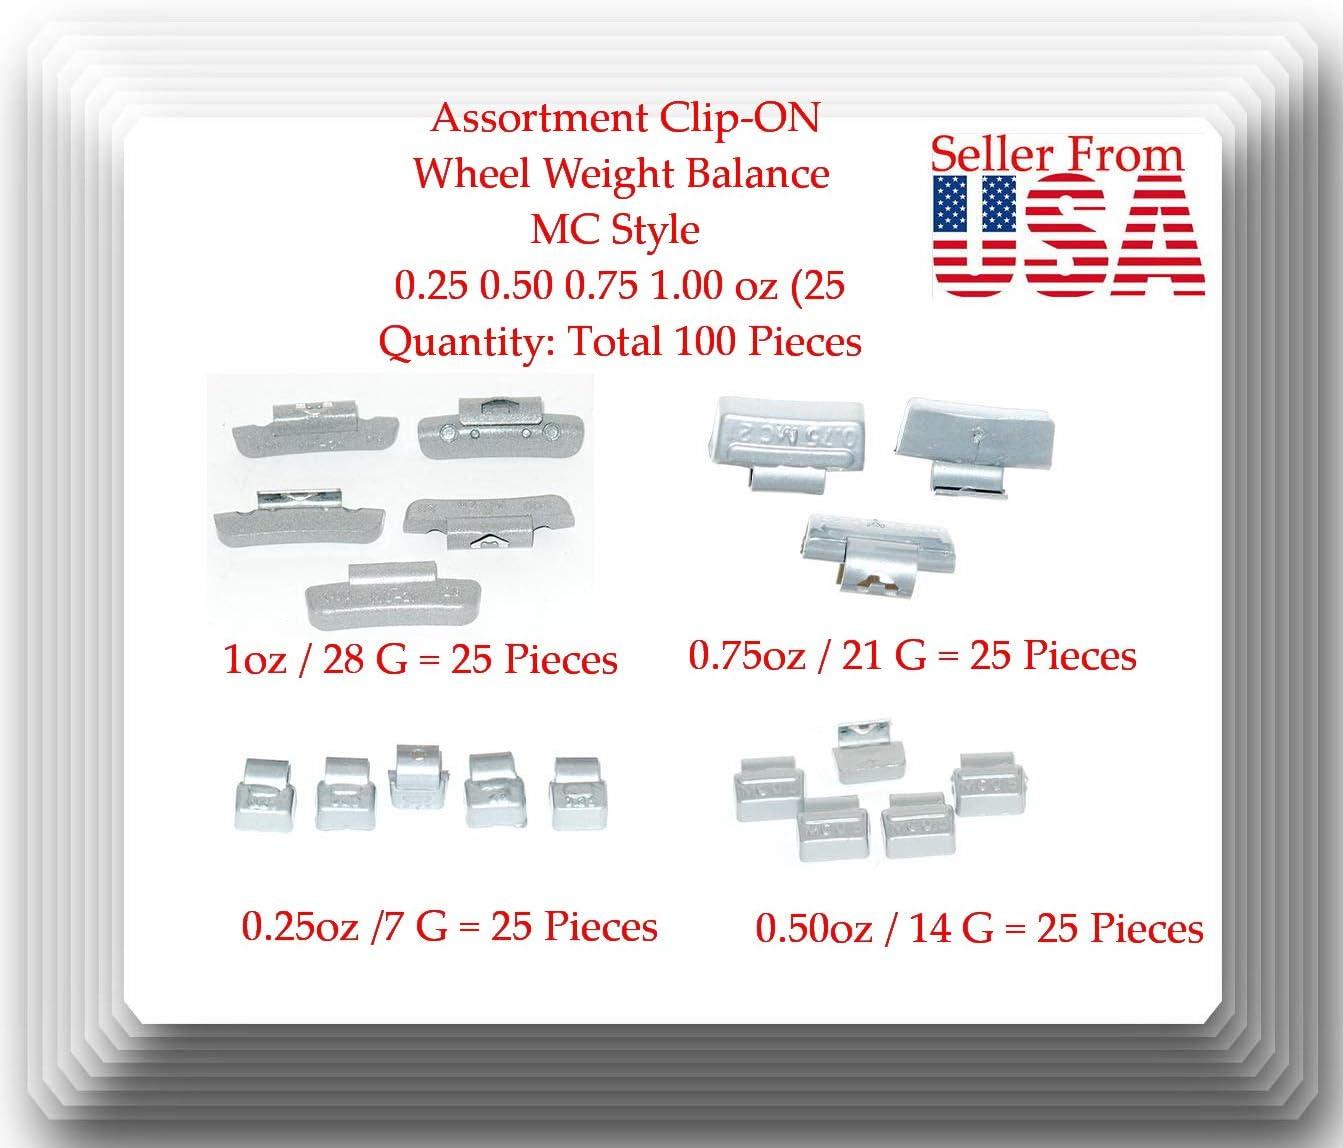 Total100 Pcs Assortment Clip-ON Wheel Weight Balance MC Style 0.25 0.50 0.75 1.00 oz 25 Each VPro by GlobalSourceAMZ